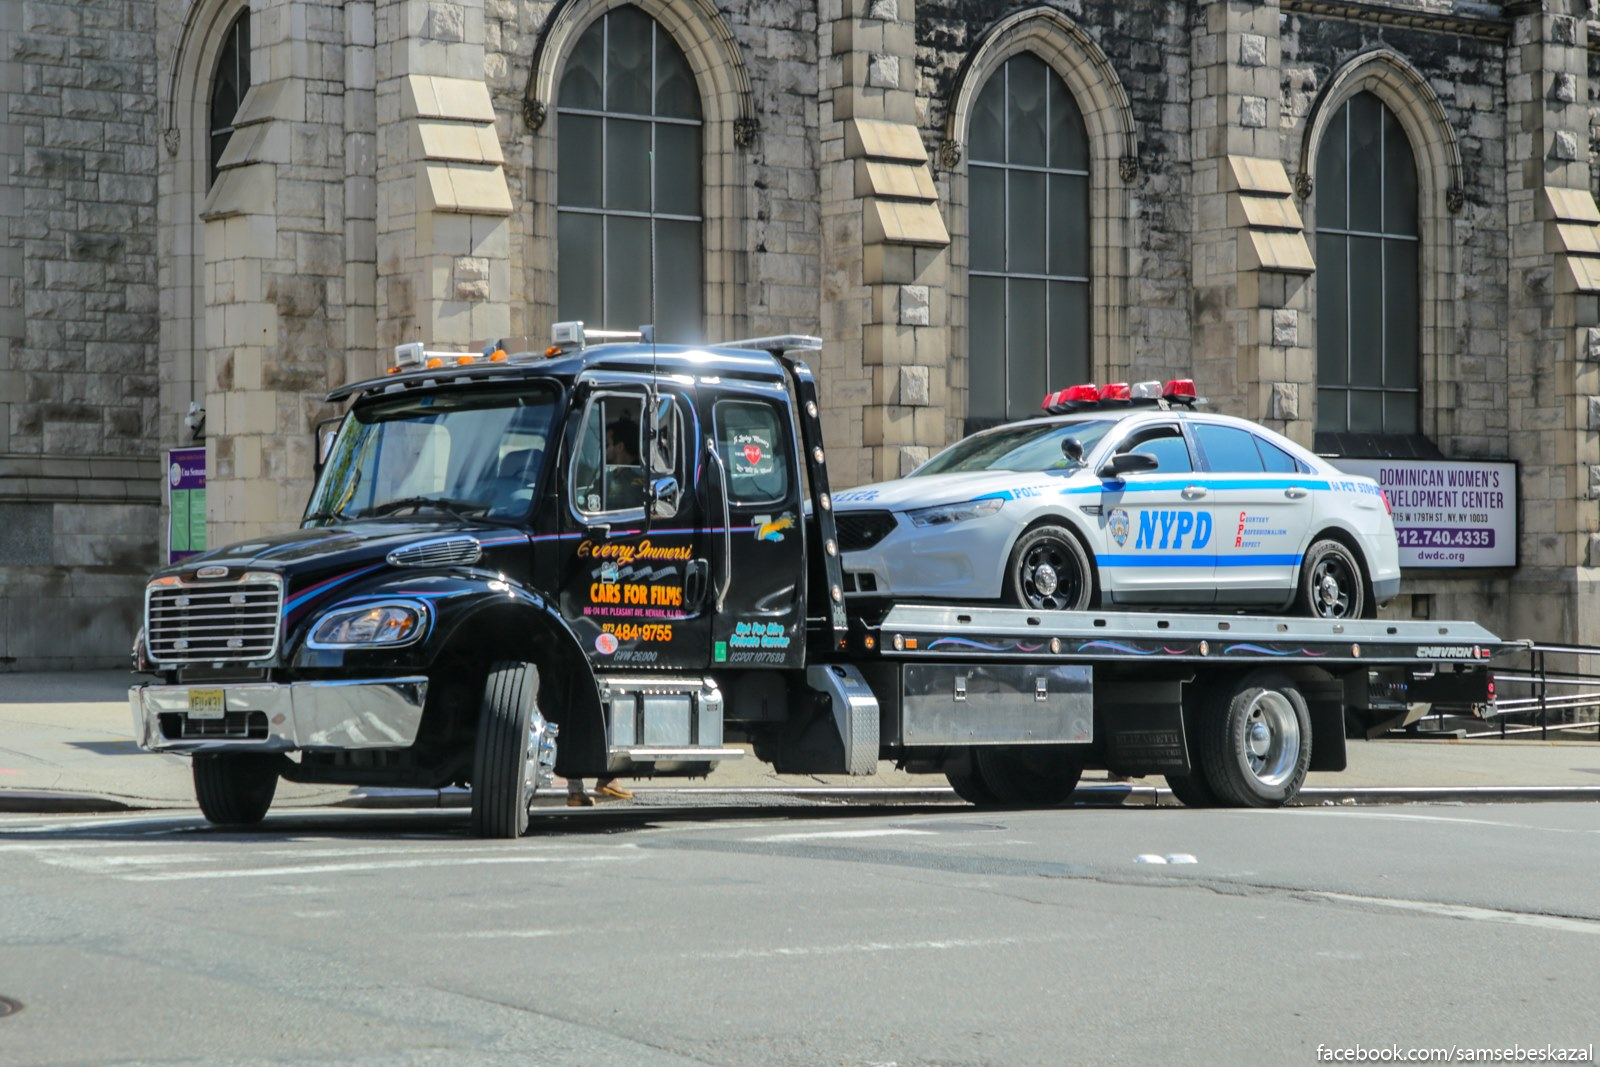 Kinosniki privezli policejskuu masinu na sʺemku. Tut vse ponatno iz-za nadpisi na dveri evakuatora, no eli by ee ne bylo, kak ese opredelitʹ, cto masina ne nastoasaa iz NYPD, a kinosnaa?